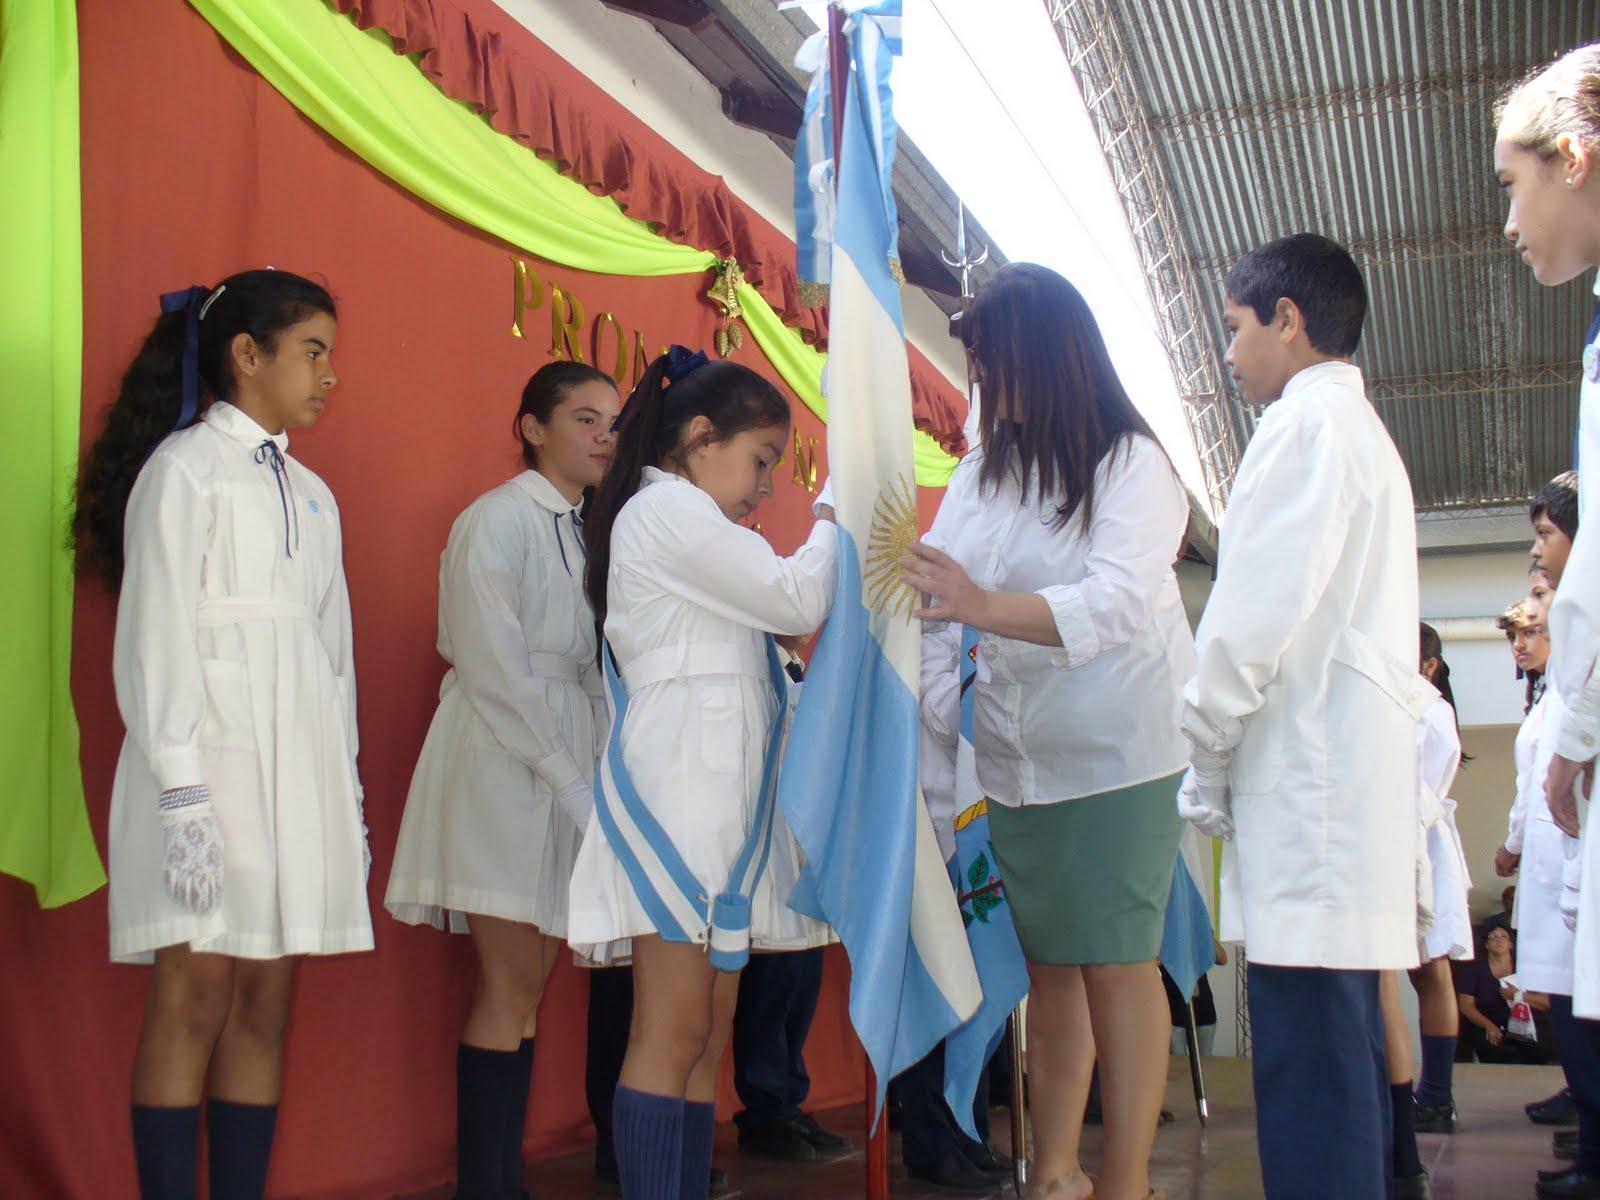 Pin Glosas Para Acto Dia Los Jardines Infantes Maestra Jardinera on